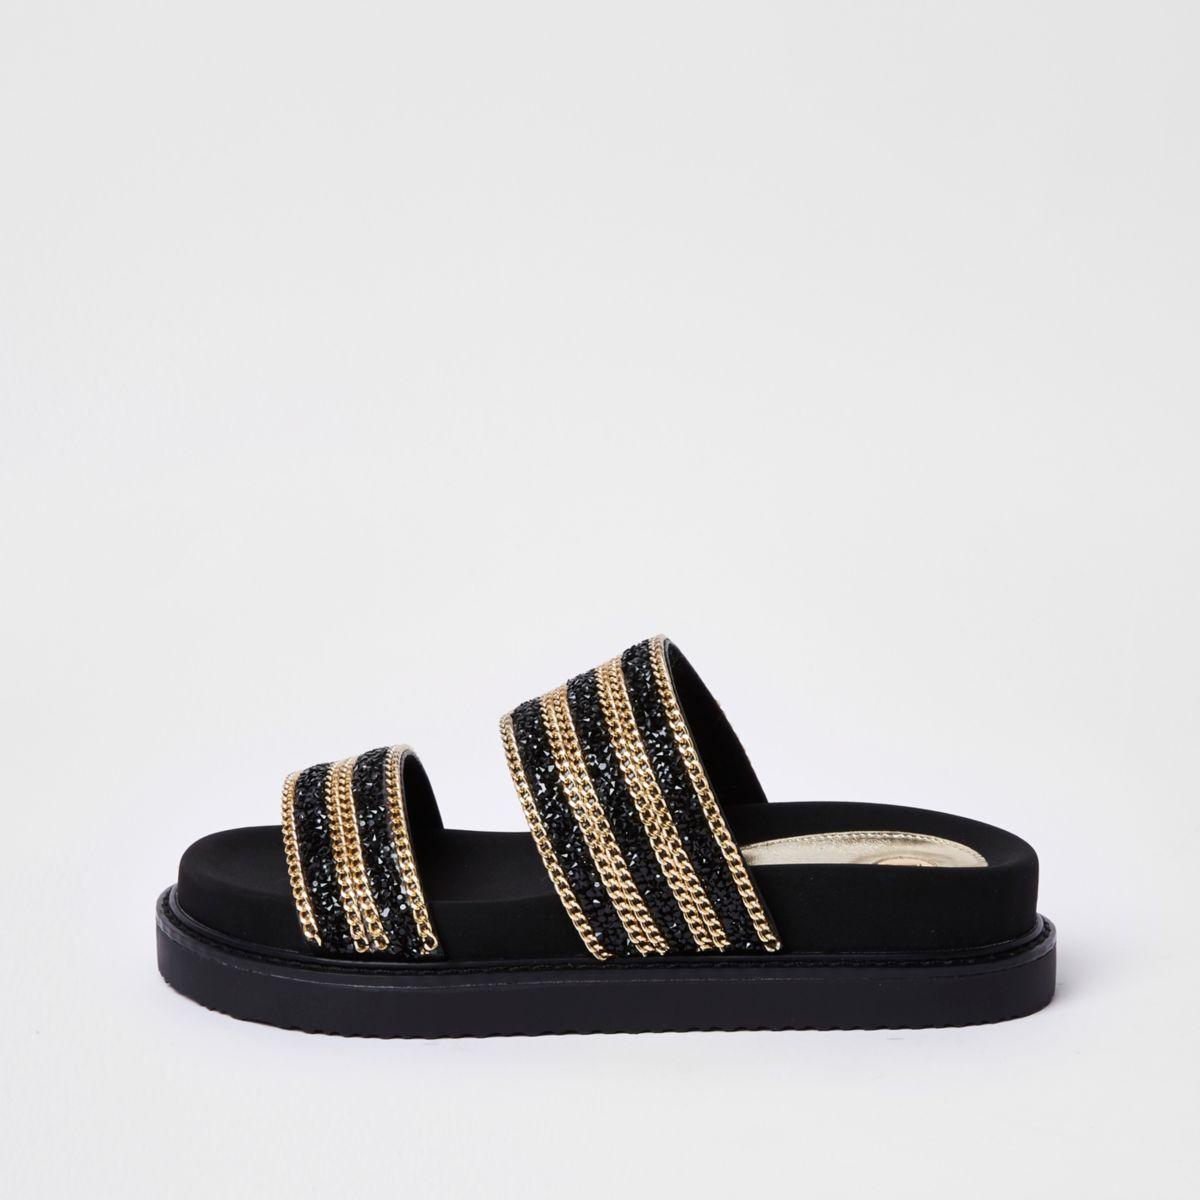 Zwarte sandalen met dubbele ketting